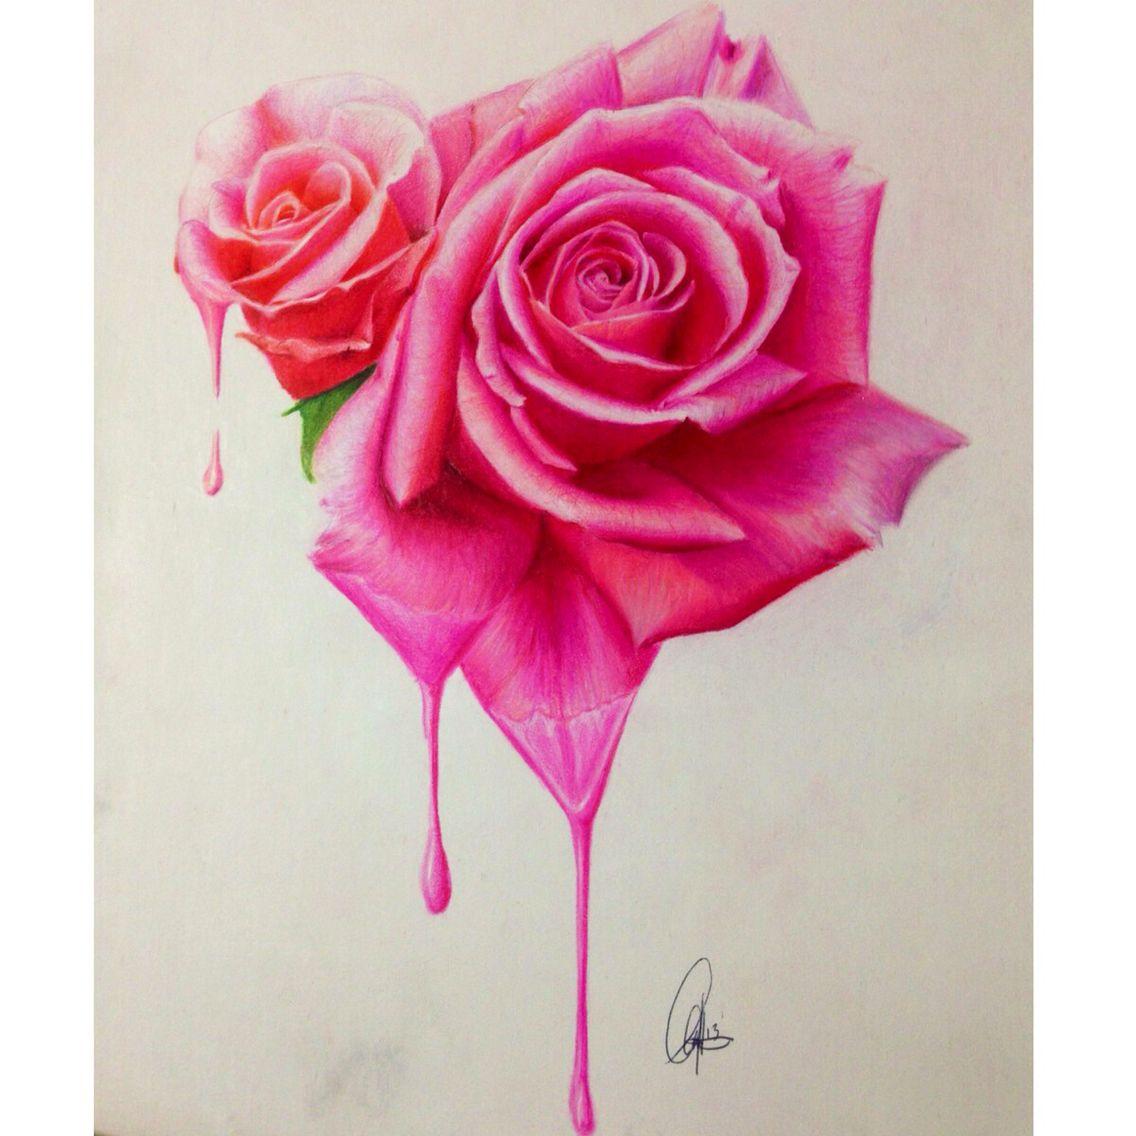 Colored Pencil Rose | Colored Pencil | Pinterest | Colored pencils ...